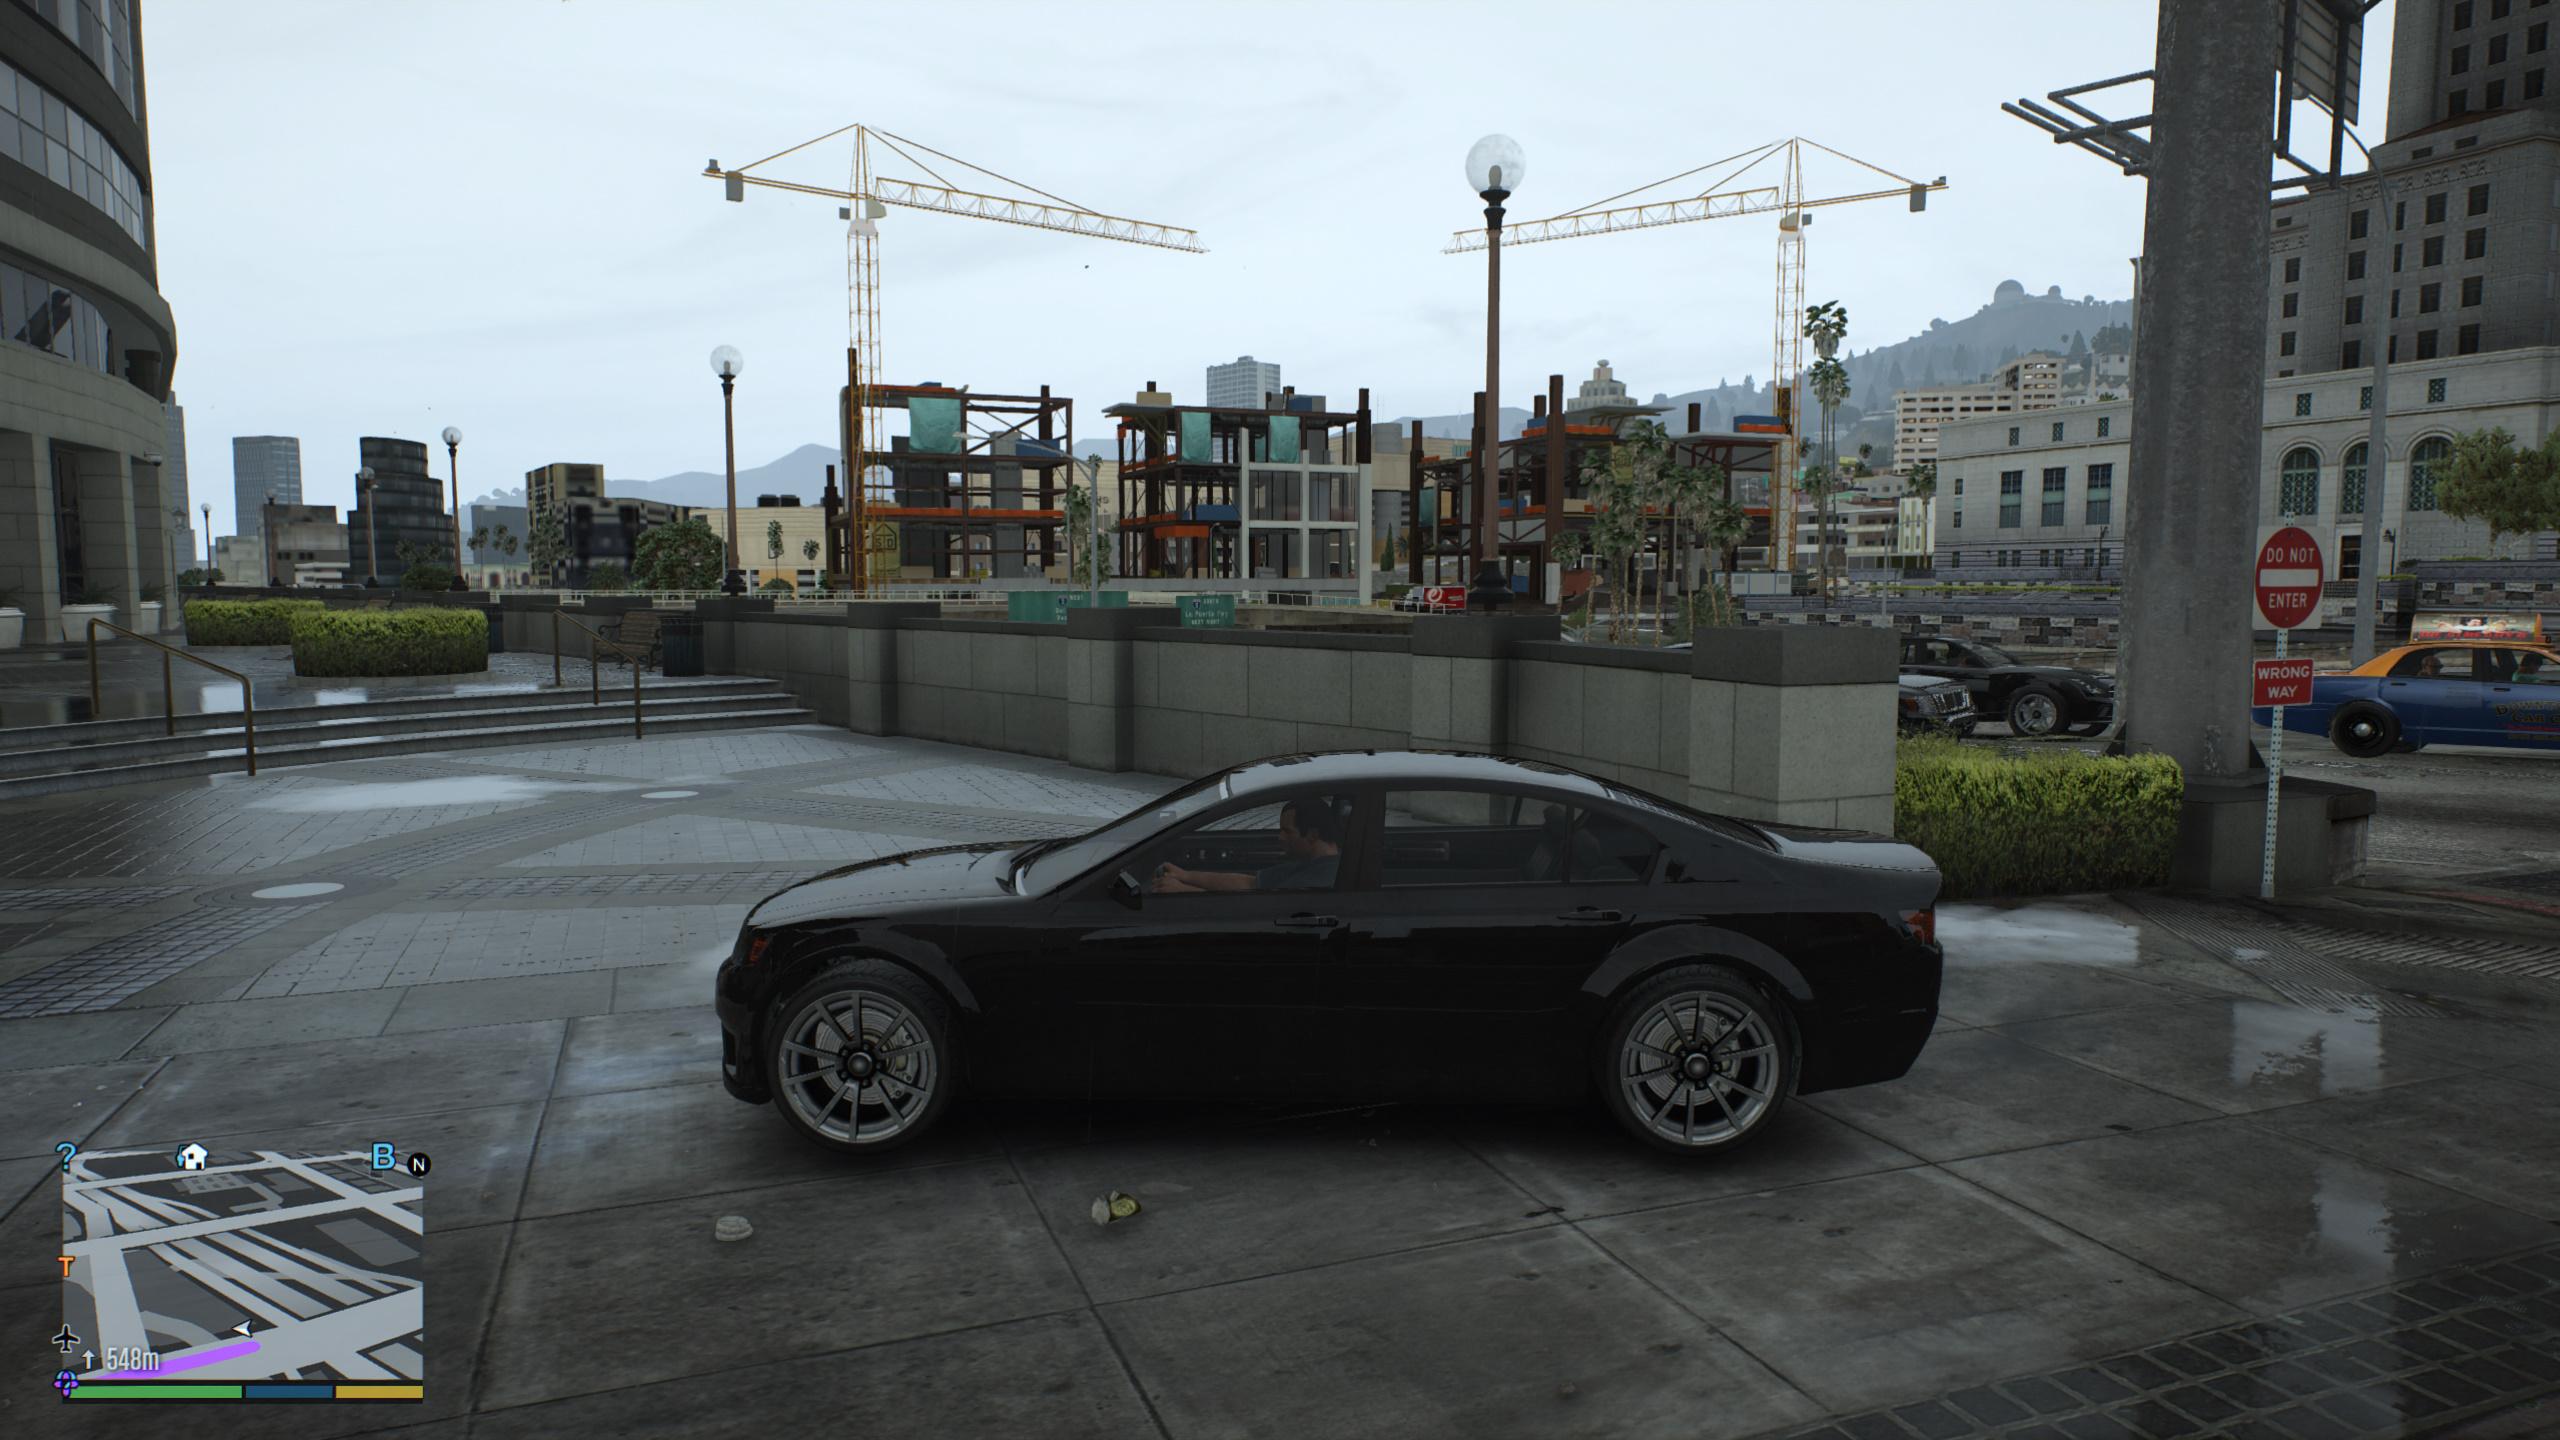 GTA5 2018-01-13 03-53-07-563.jpg